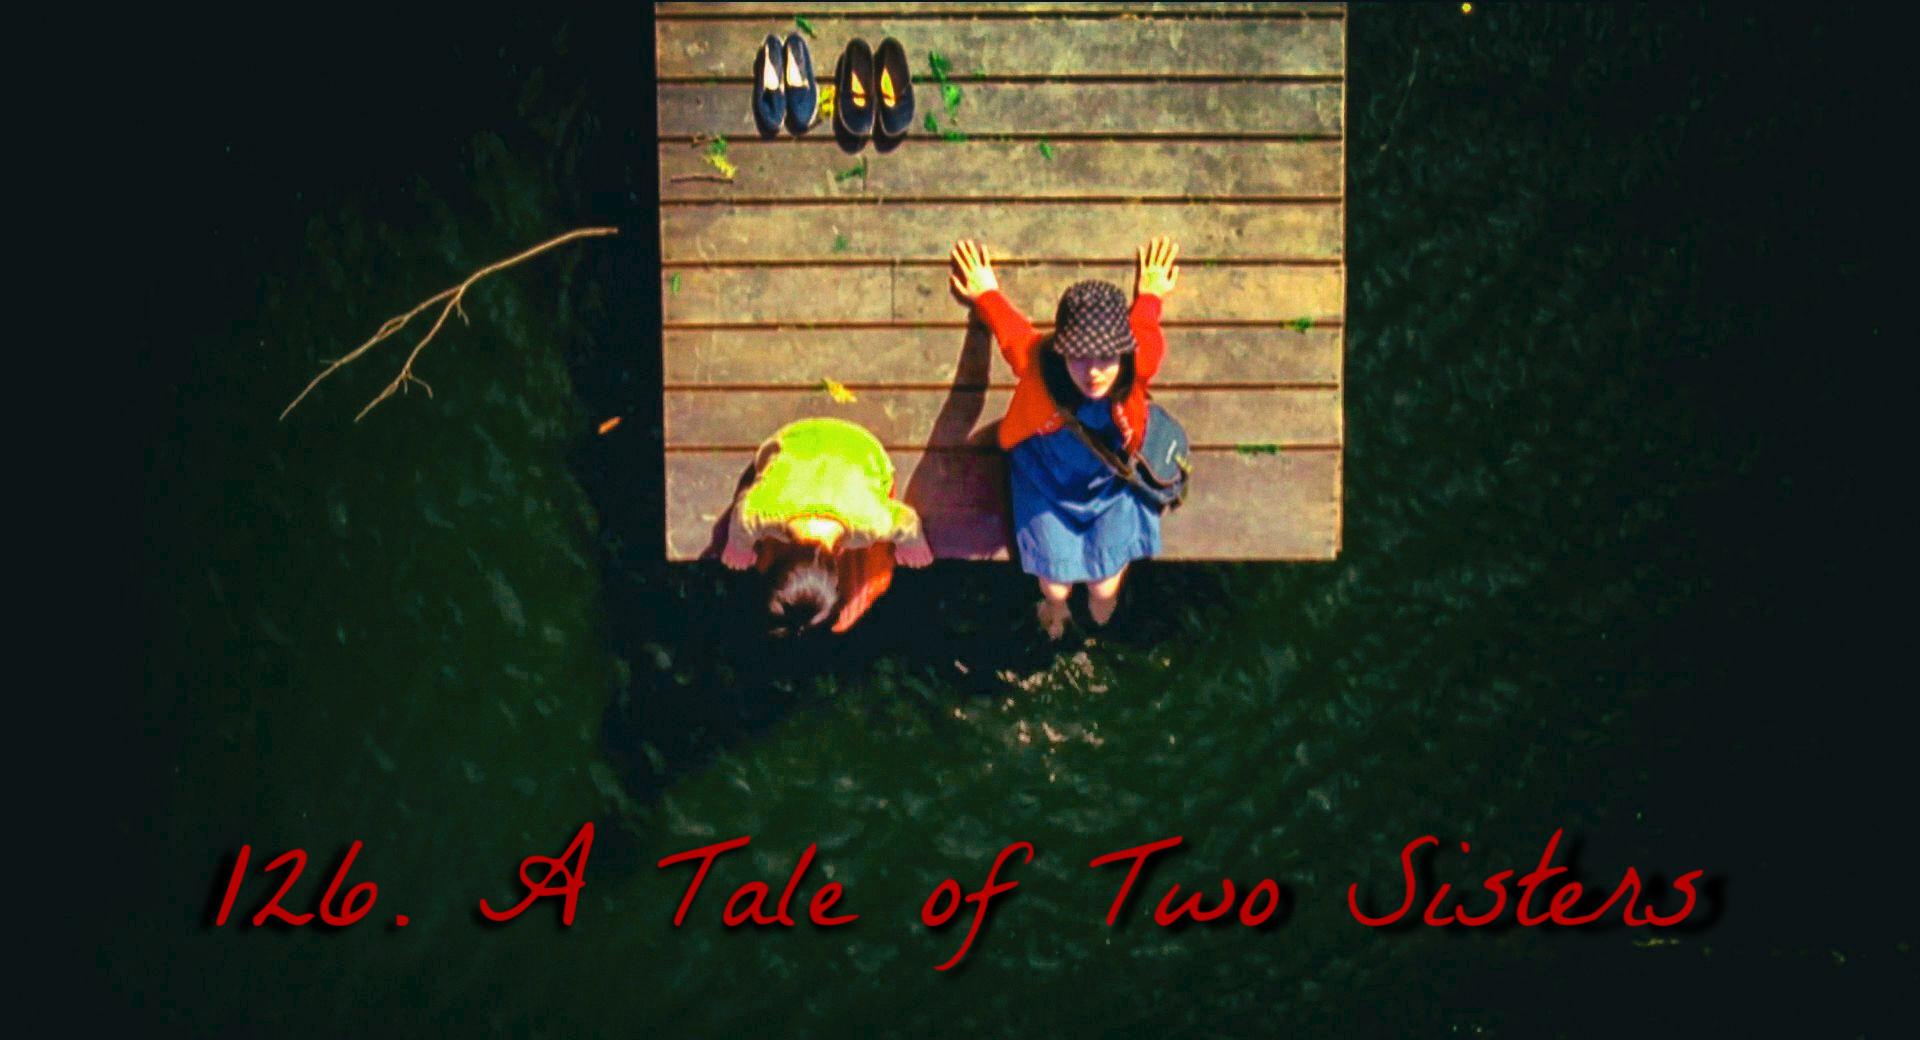 two-sisters-wharf-title.jpg